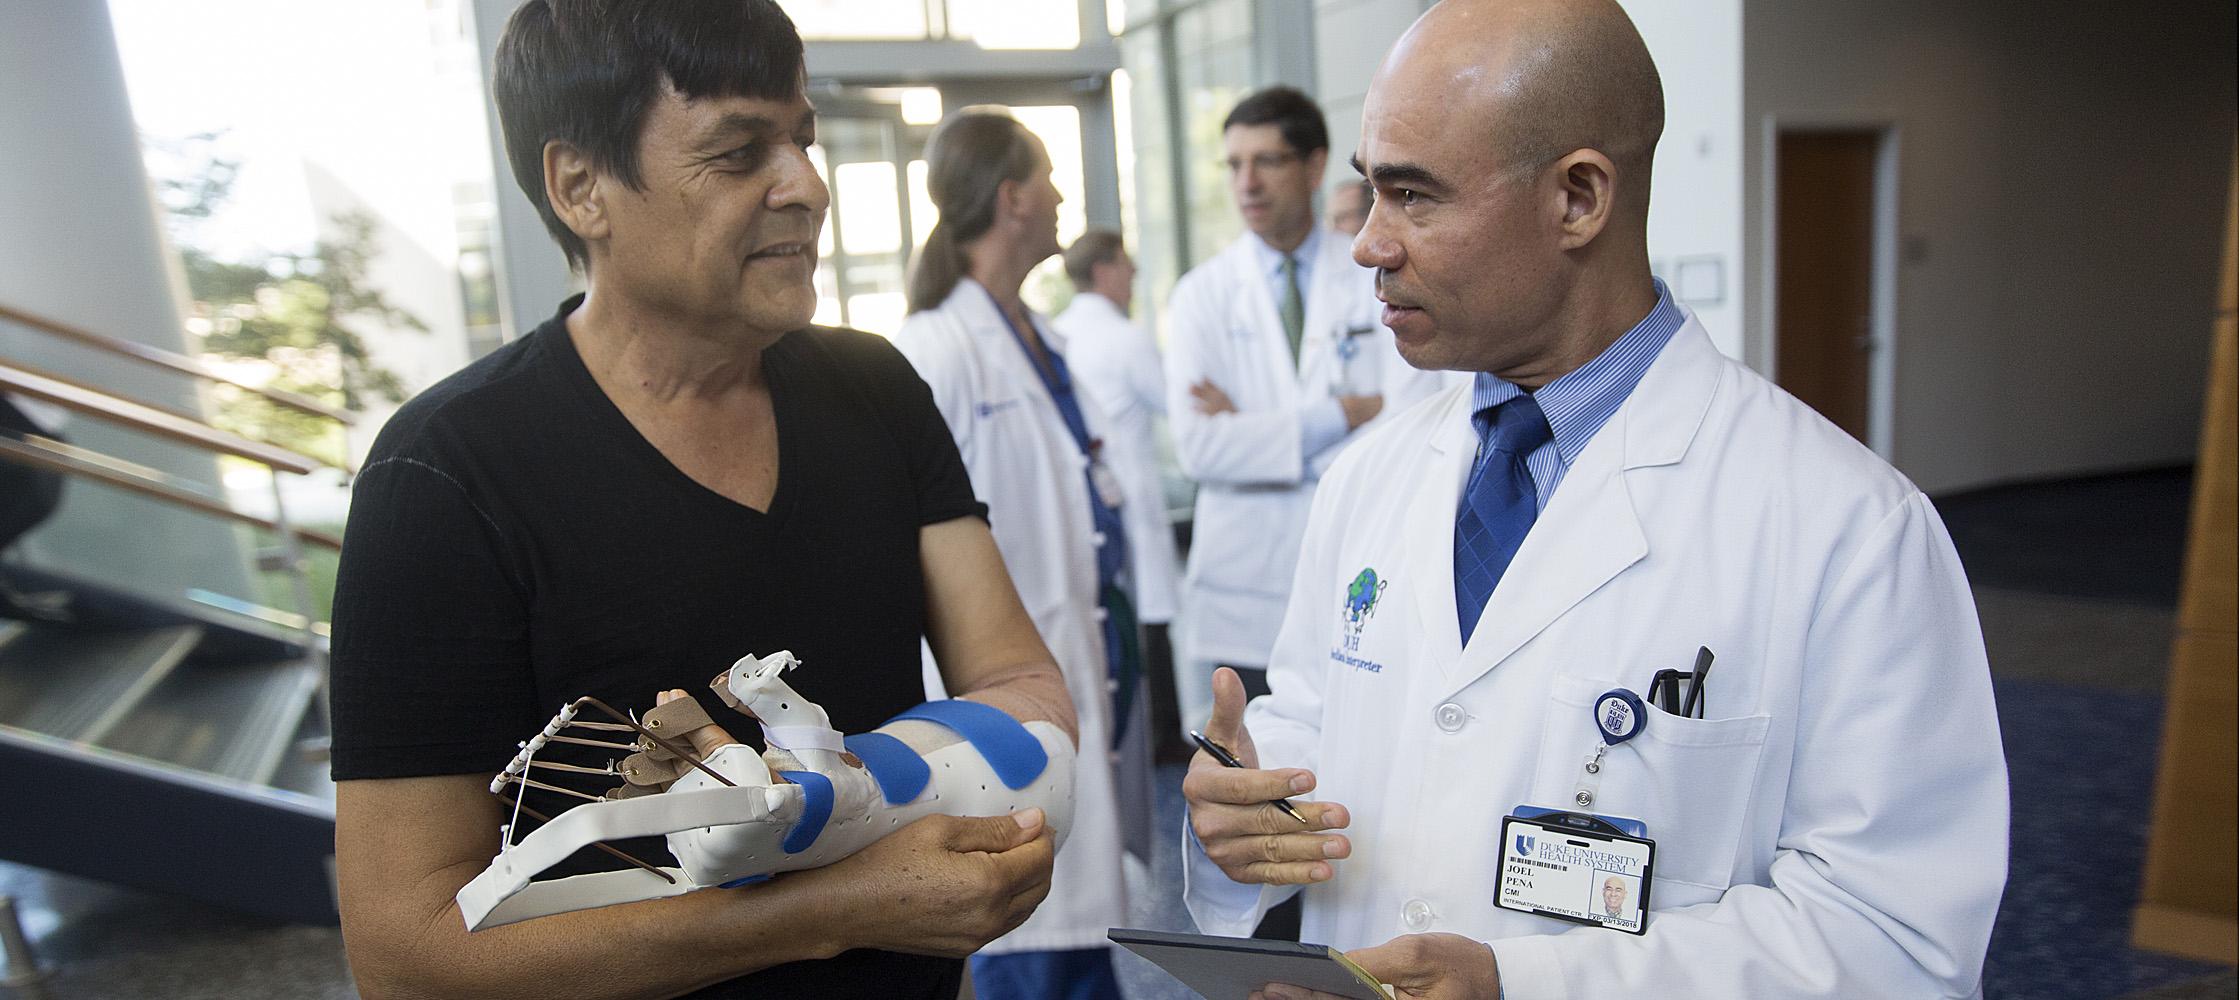 First hand transplant recipient in North Carolina at Duke